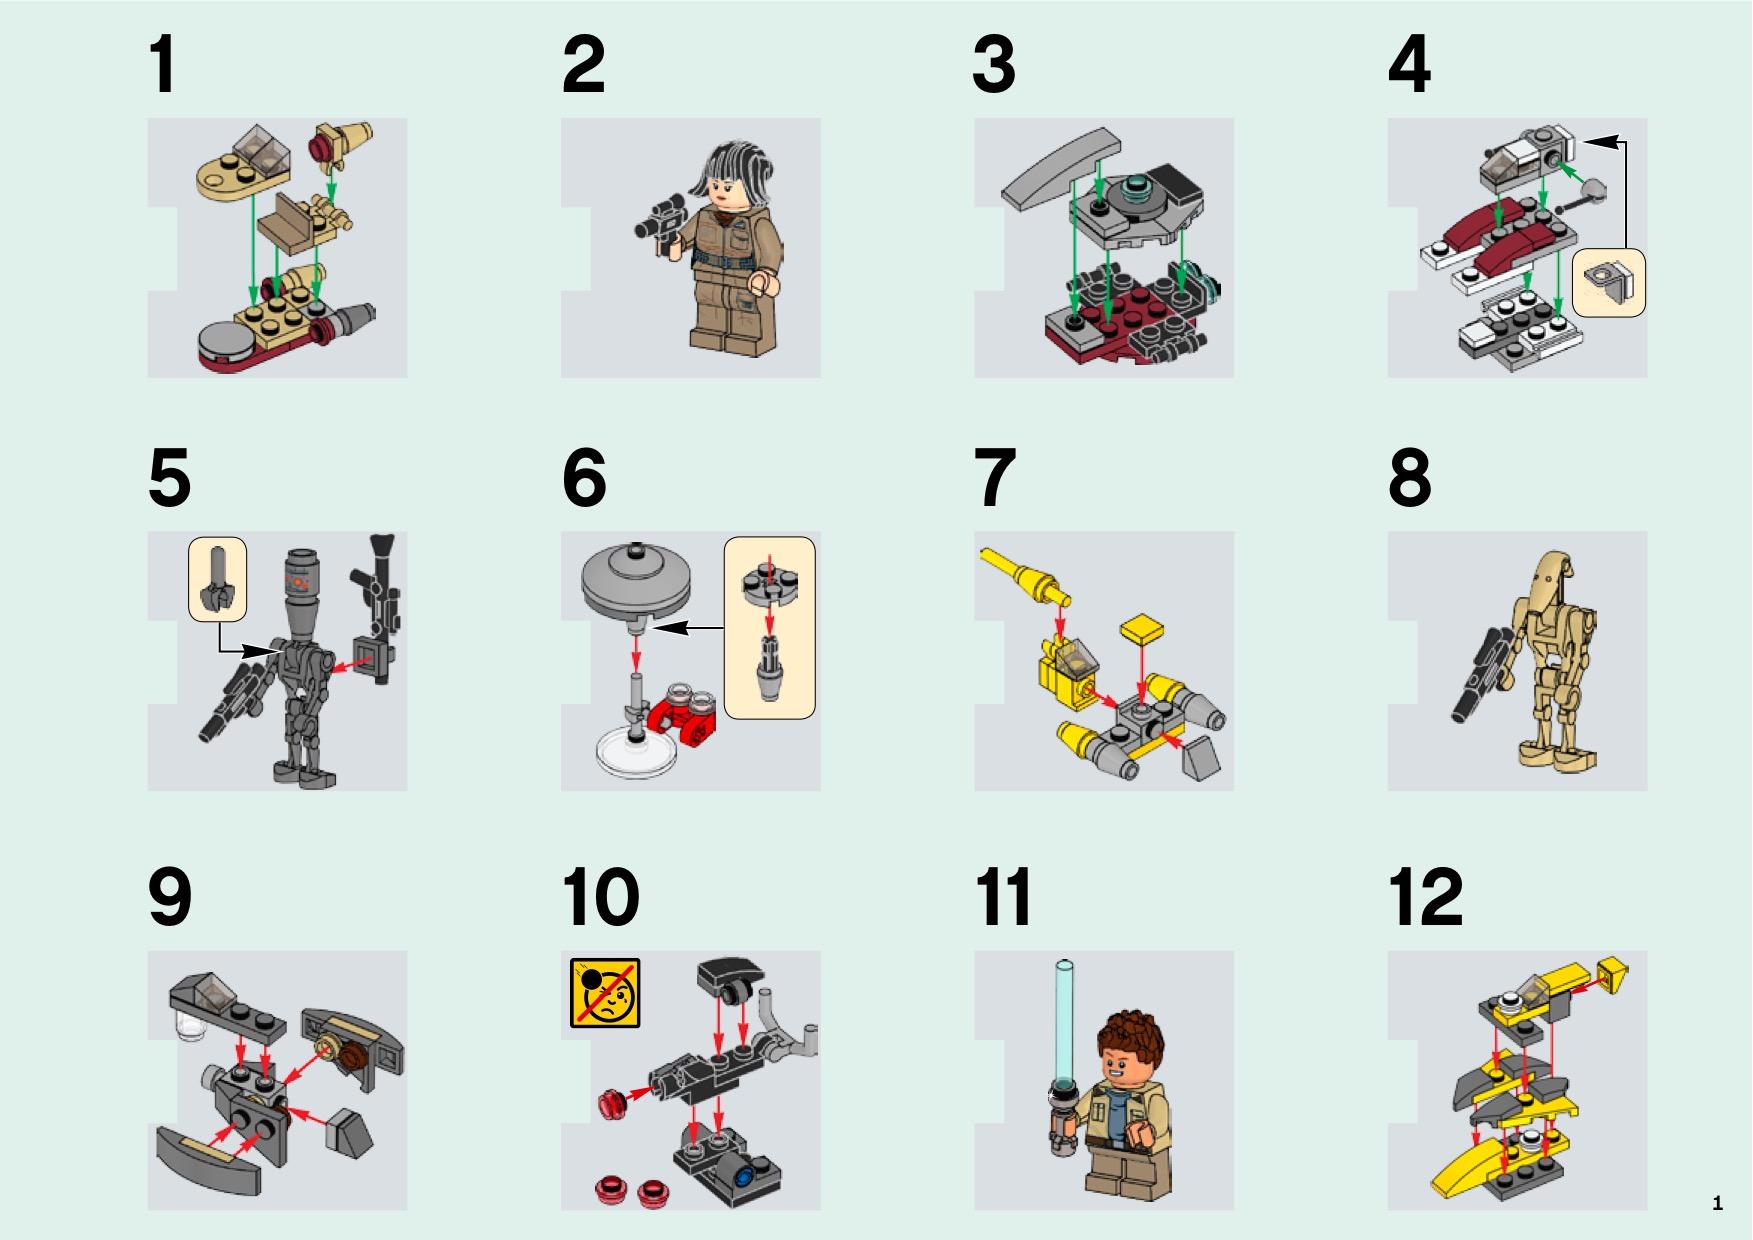 Lego 75213 Star Wars Advent Calendar Instructions, Star Wars for Lego 75213 Instructions